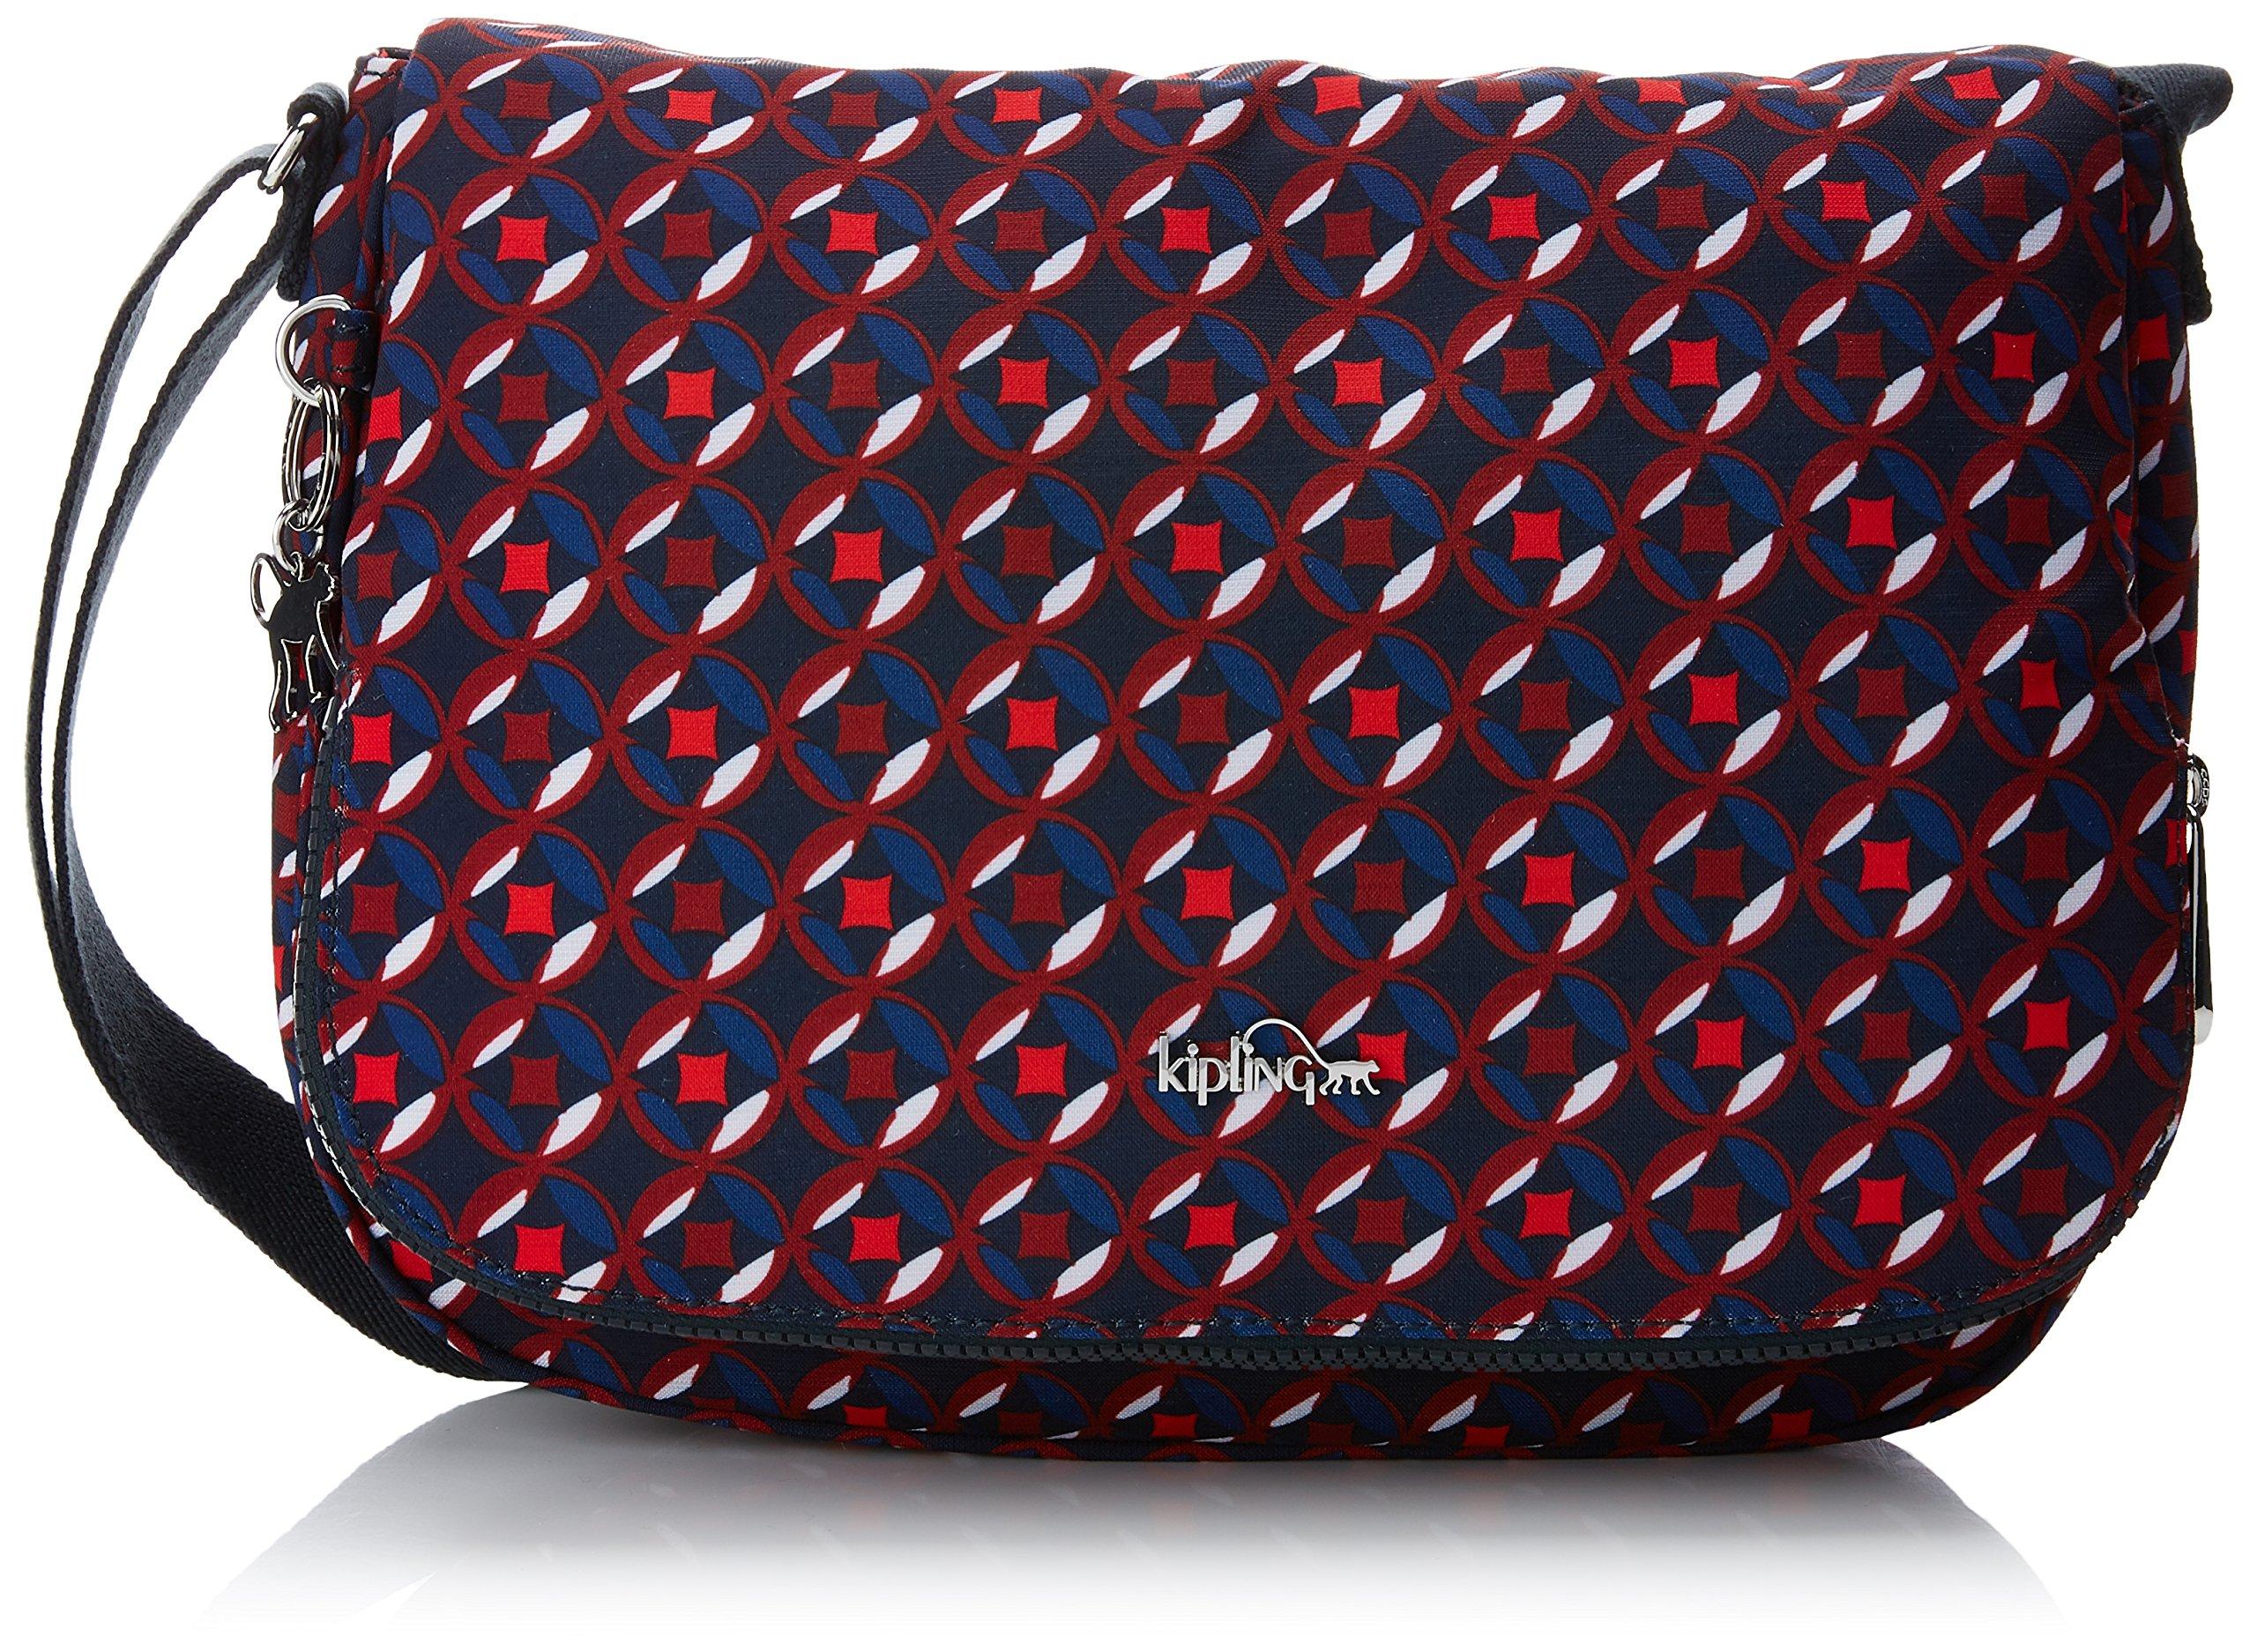 Kipling Earthbeat M, Bolso bandolera para Mujer, 30x22.5x10.5 cm product